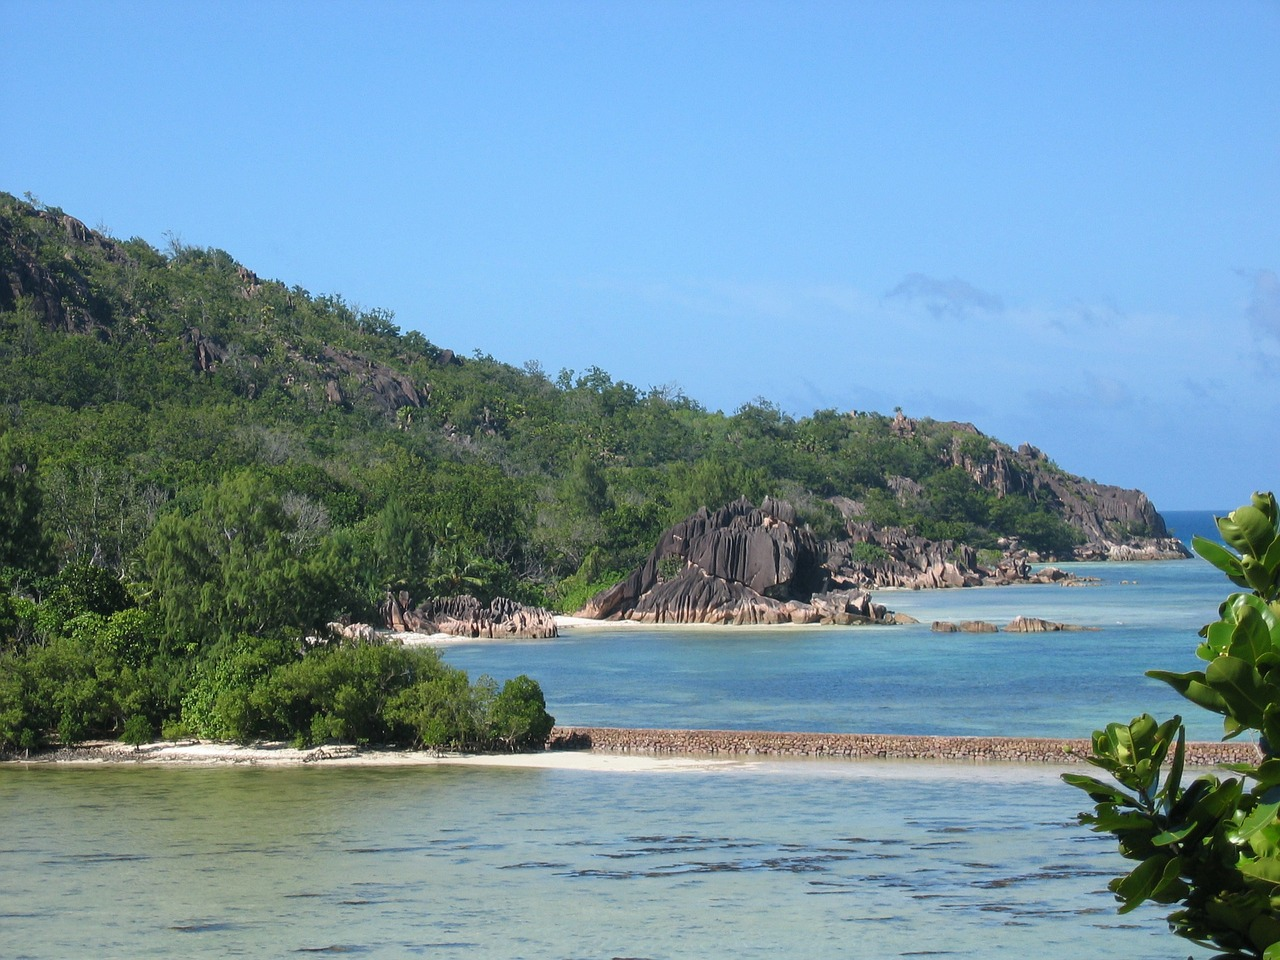 sey-island-168875_1280